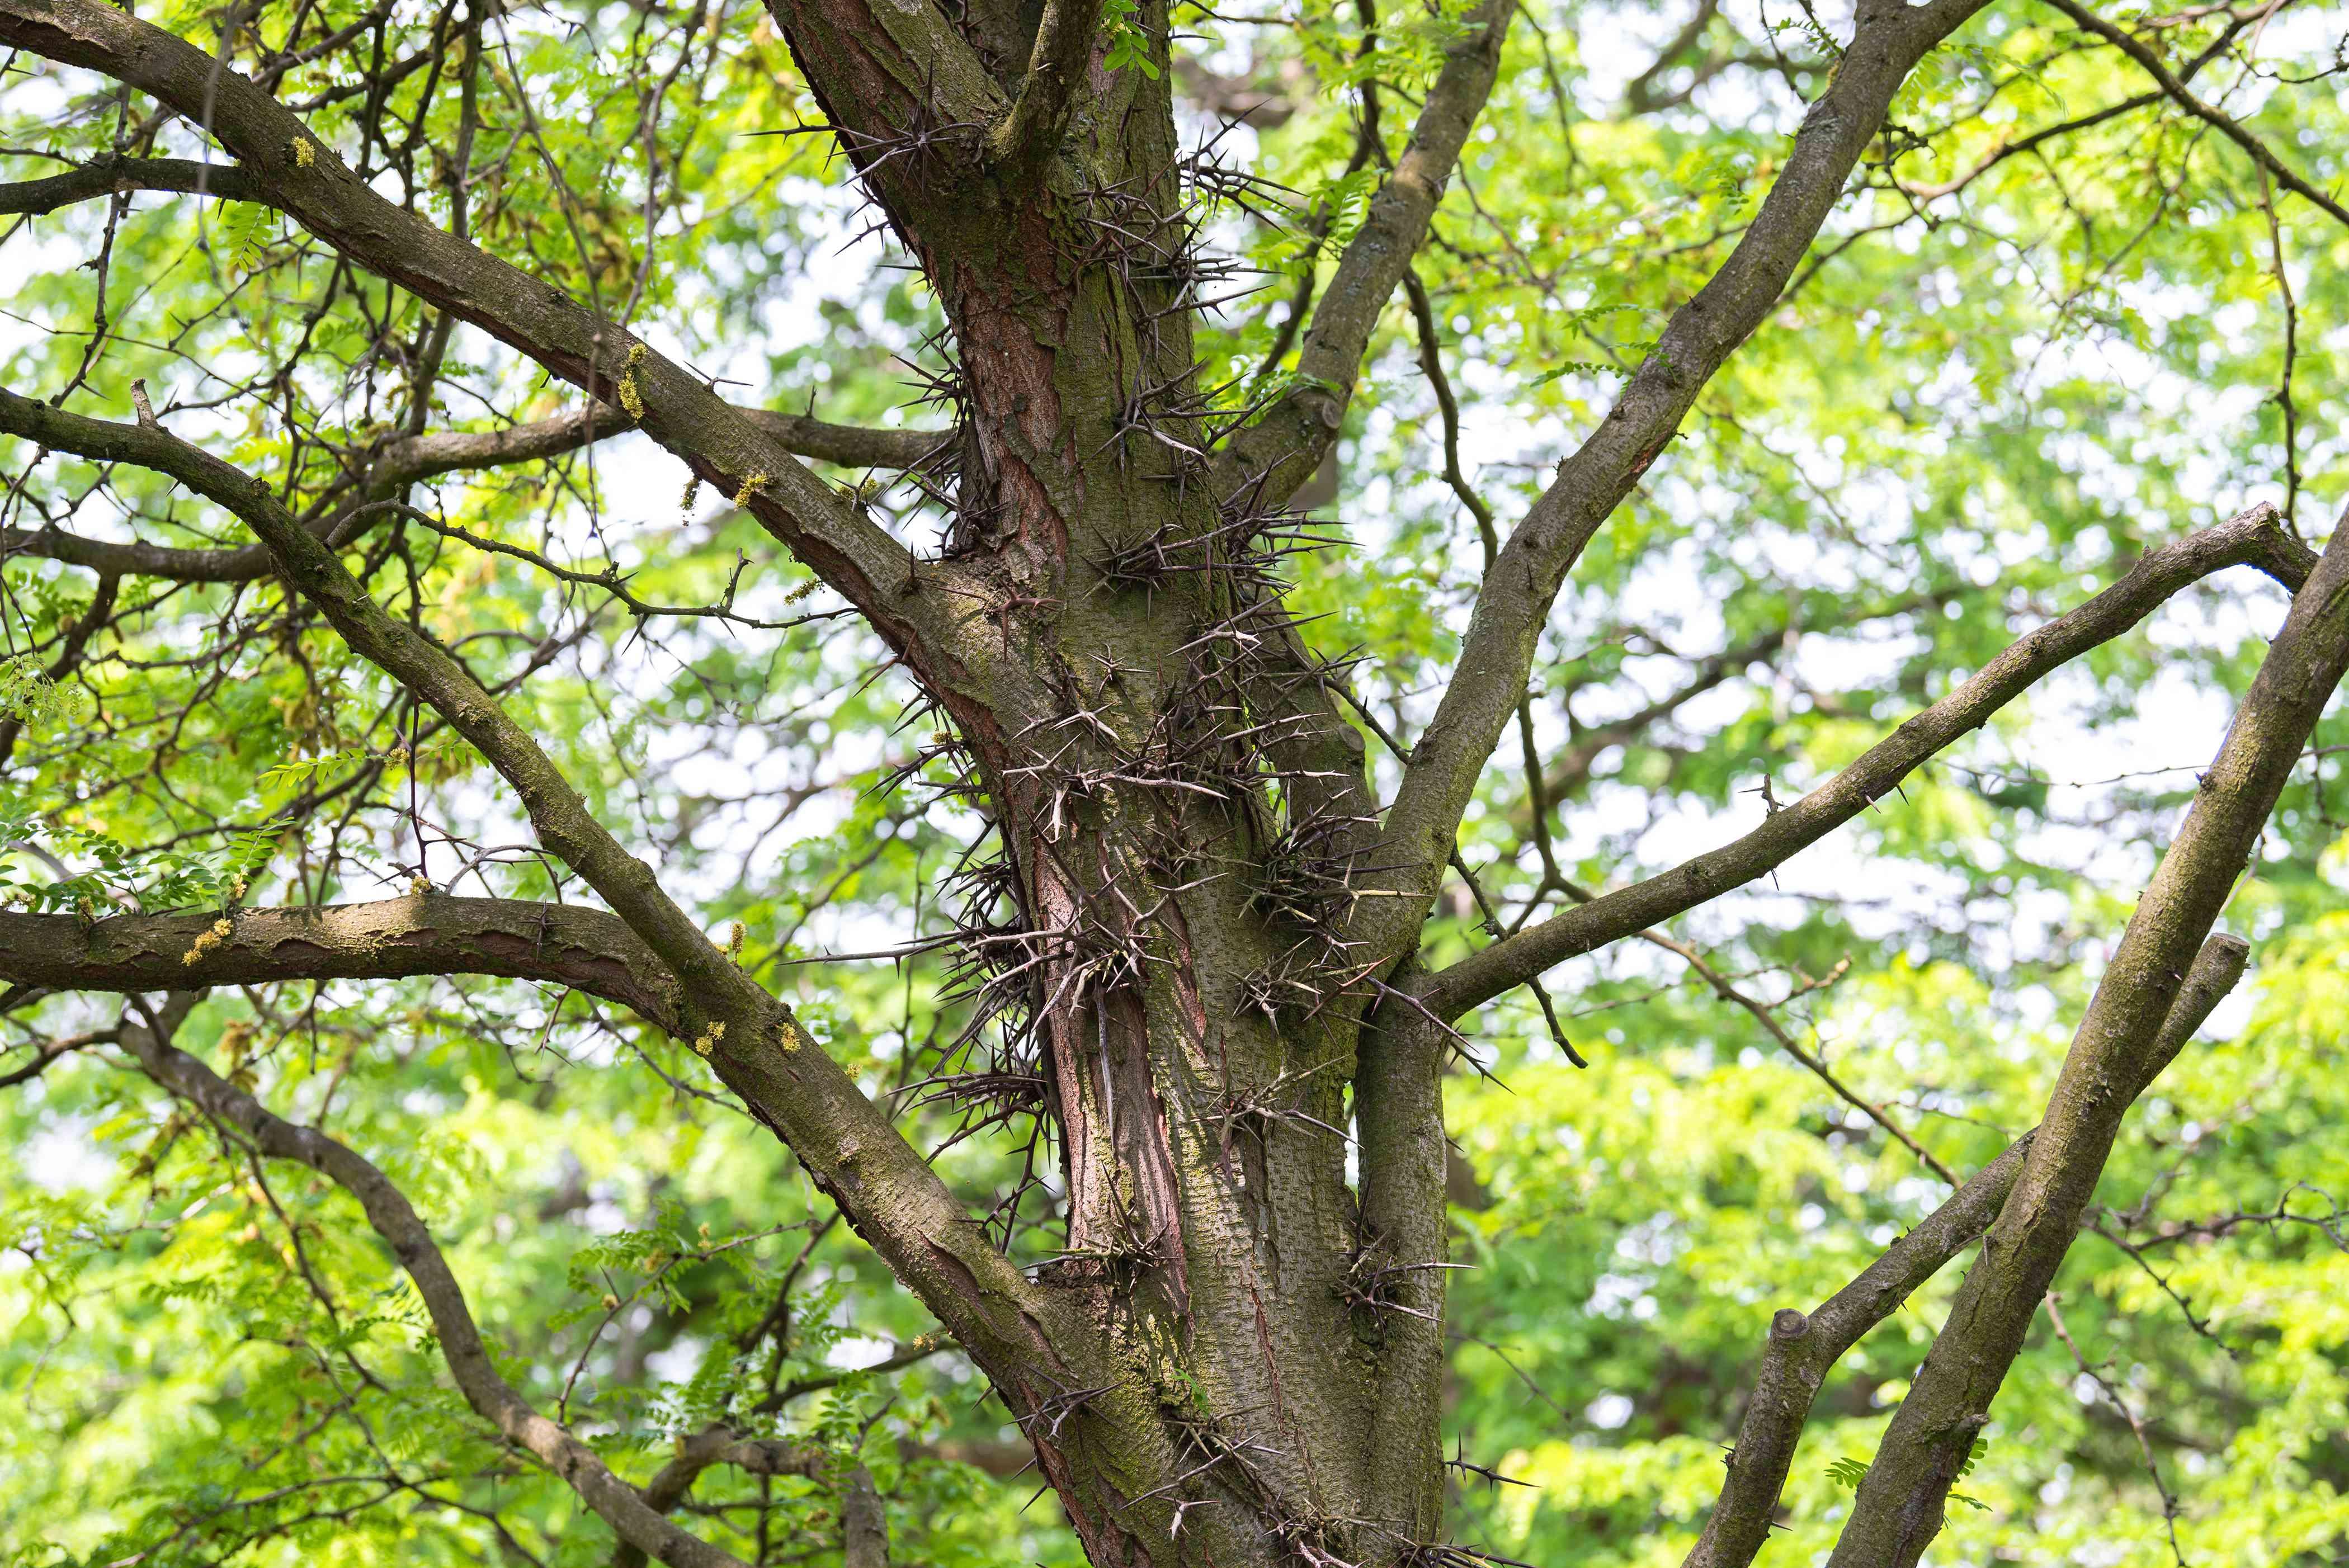 Sunburst honey locust tree trunk with large thorns